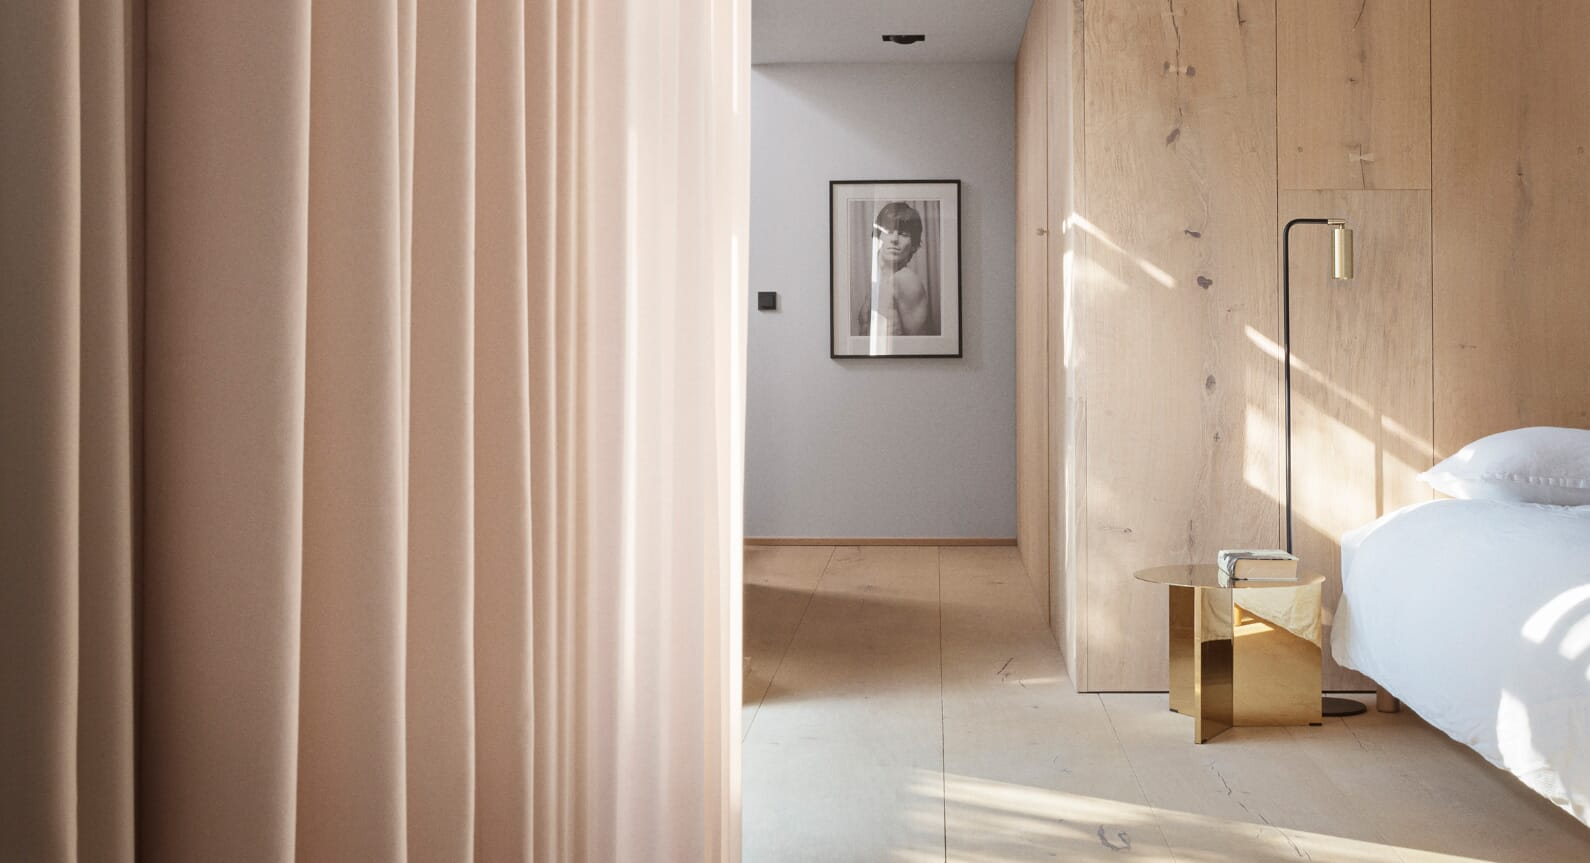 Studio David Thulstrup Turn Warehouse Into A Modern Photographer's Home